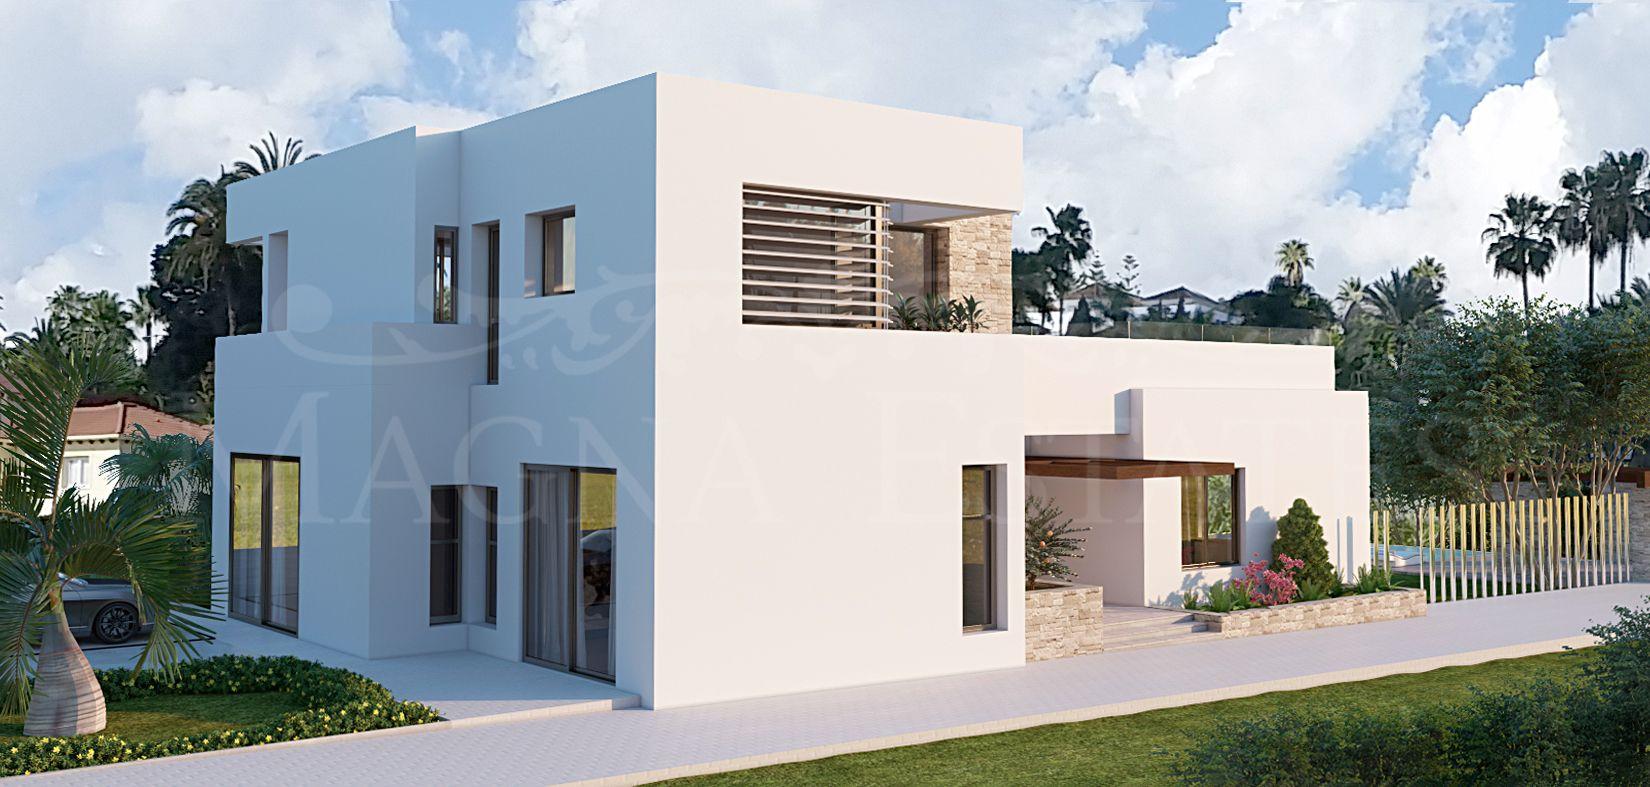 Newly built villa in the Golf Valley, Nueva Andalucía, Marbella.